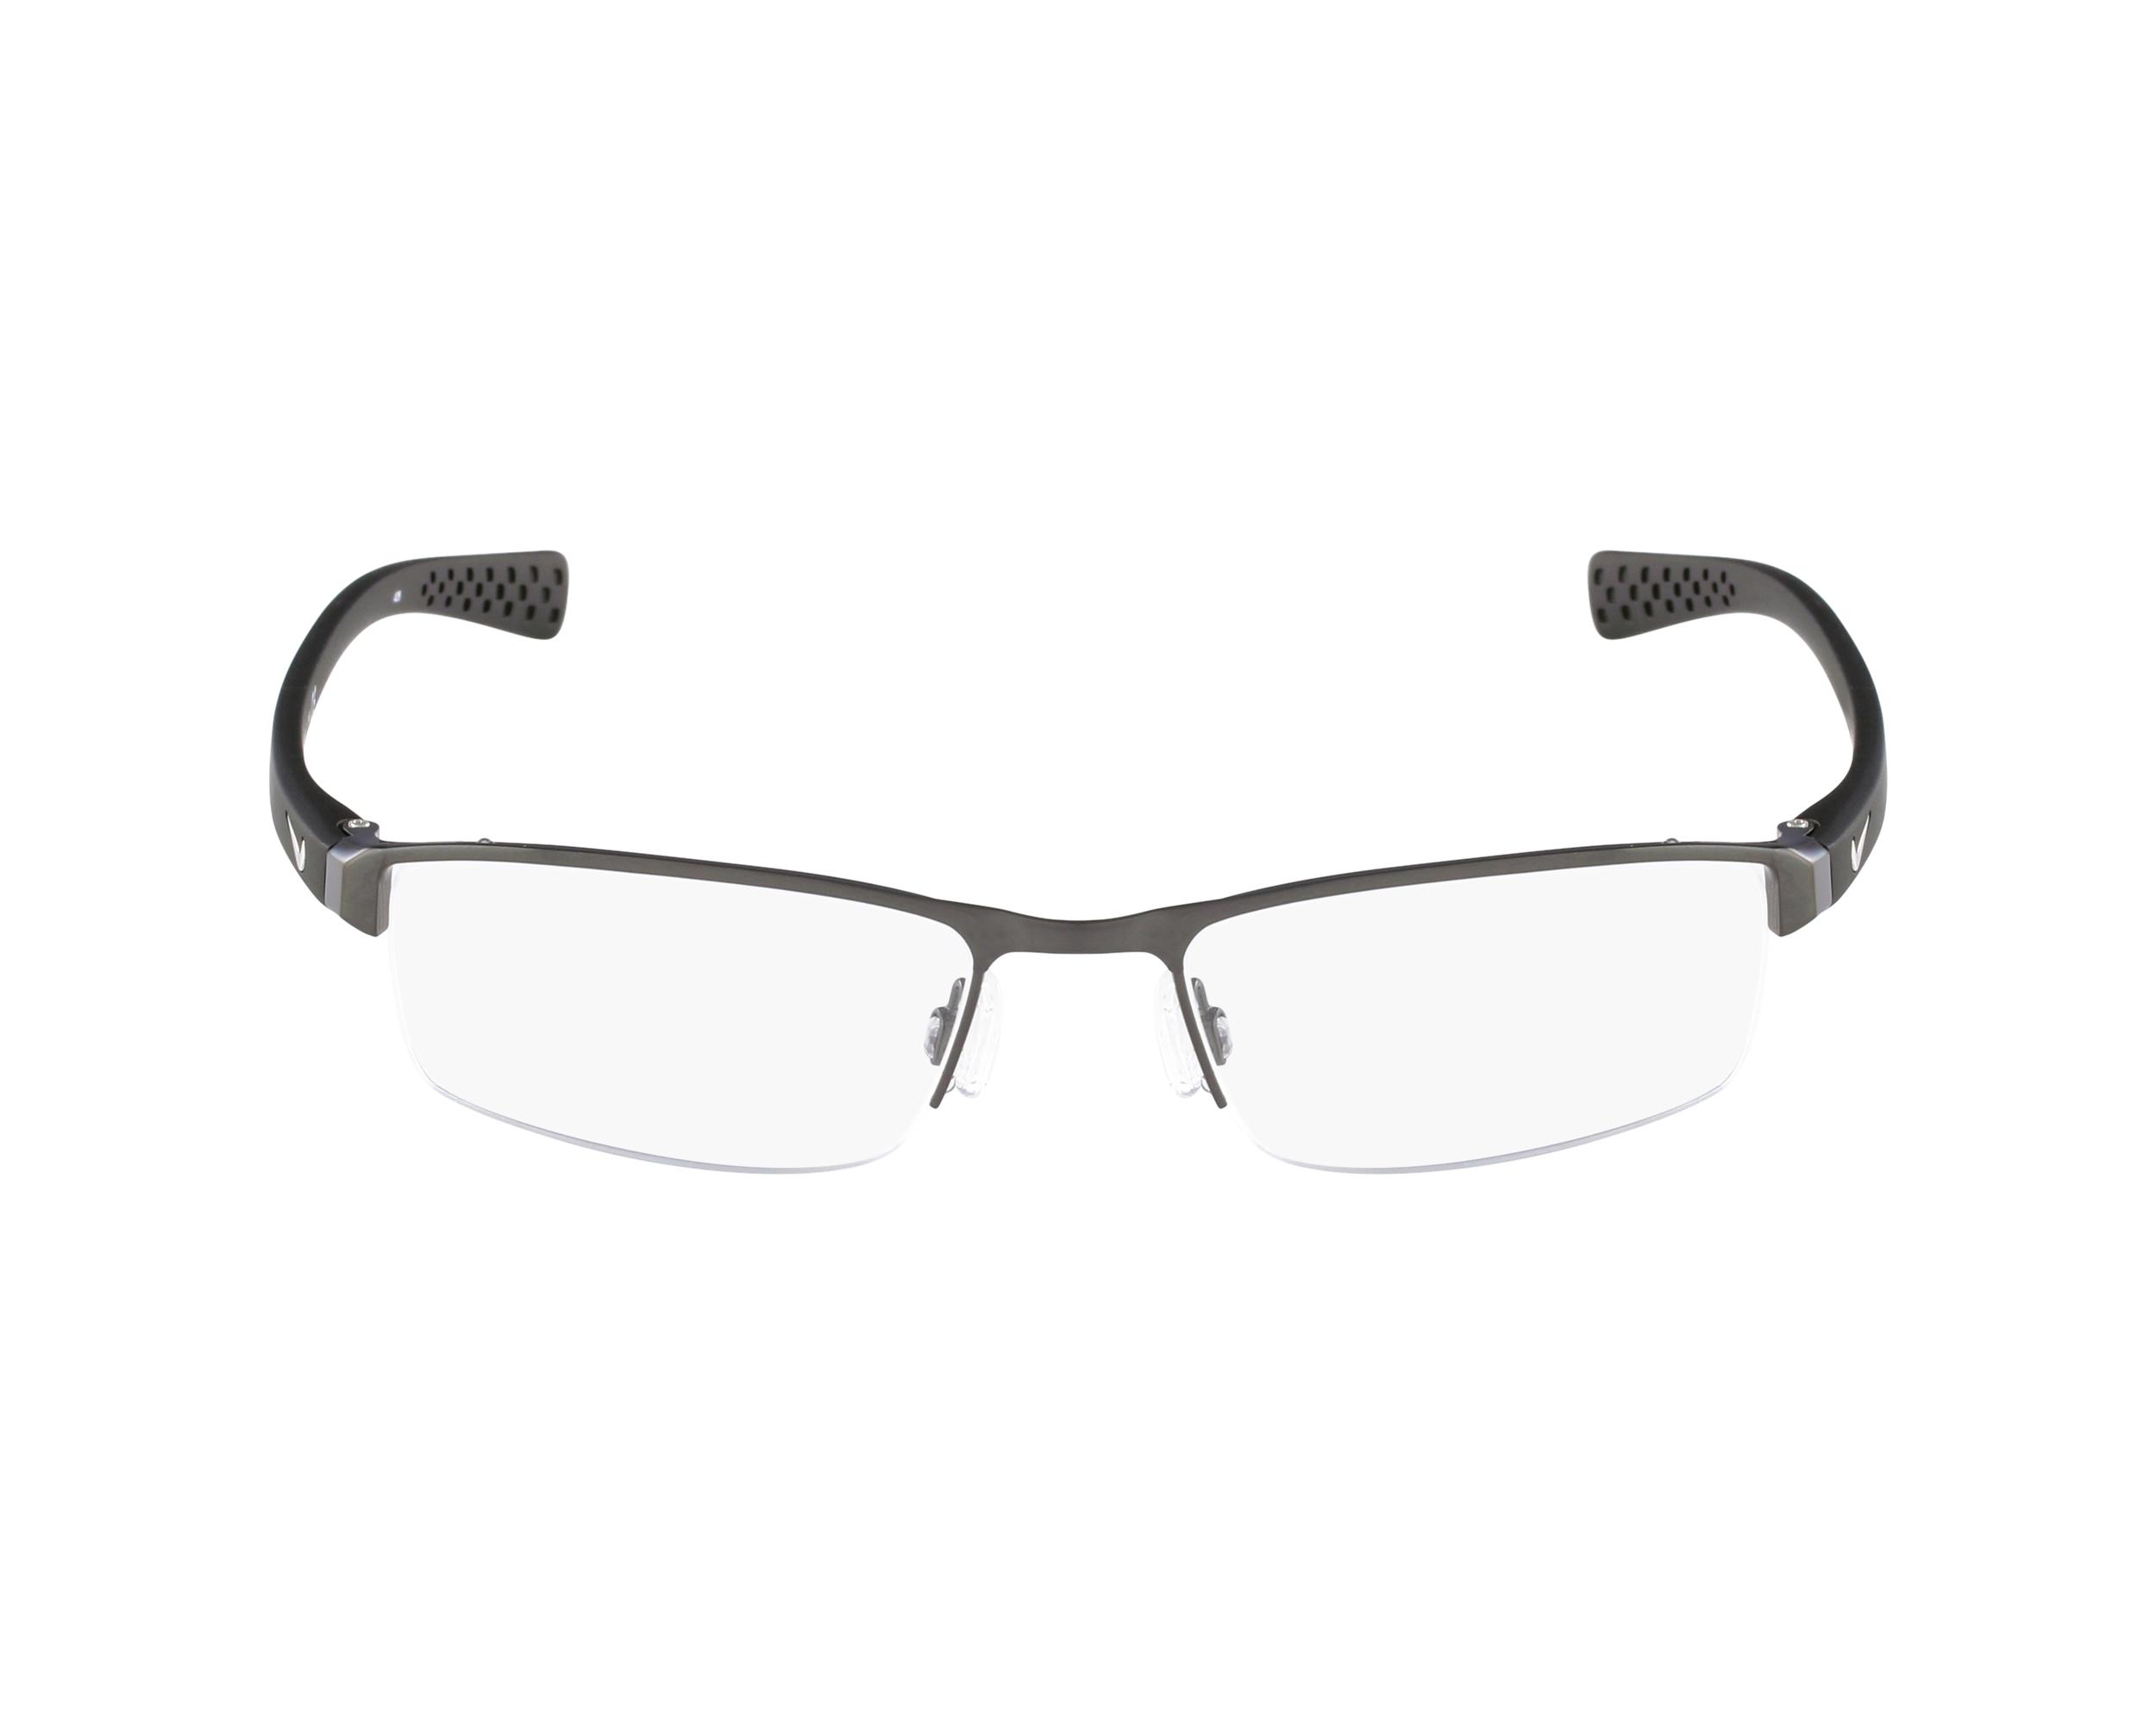 37fb4e48ec Gafas de vista Nike 8095 060 tamaño: 50 a comprar online ...